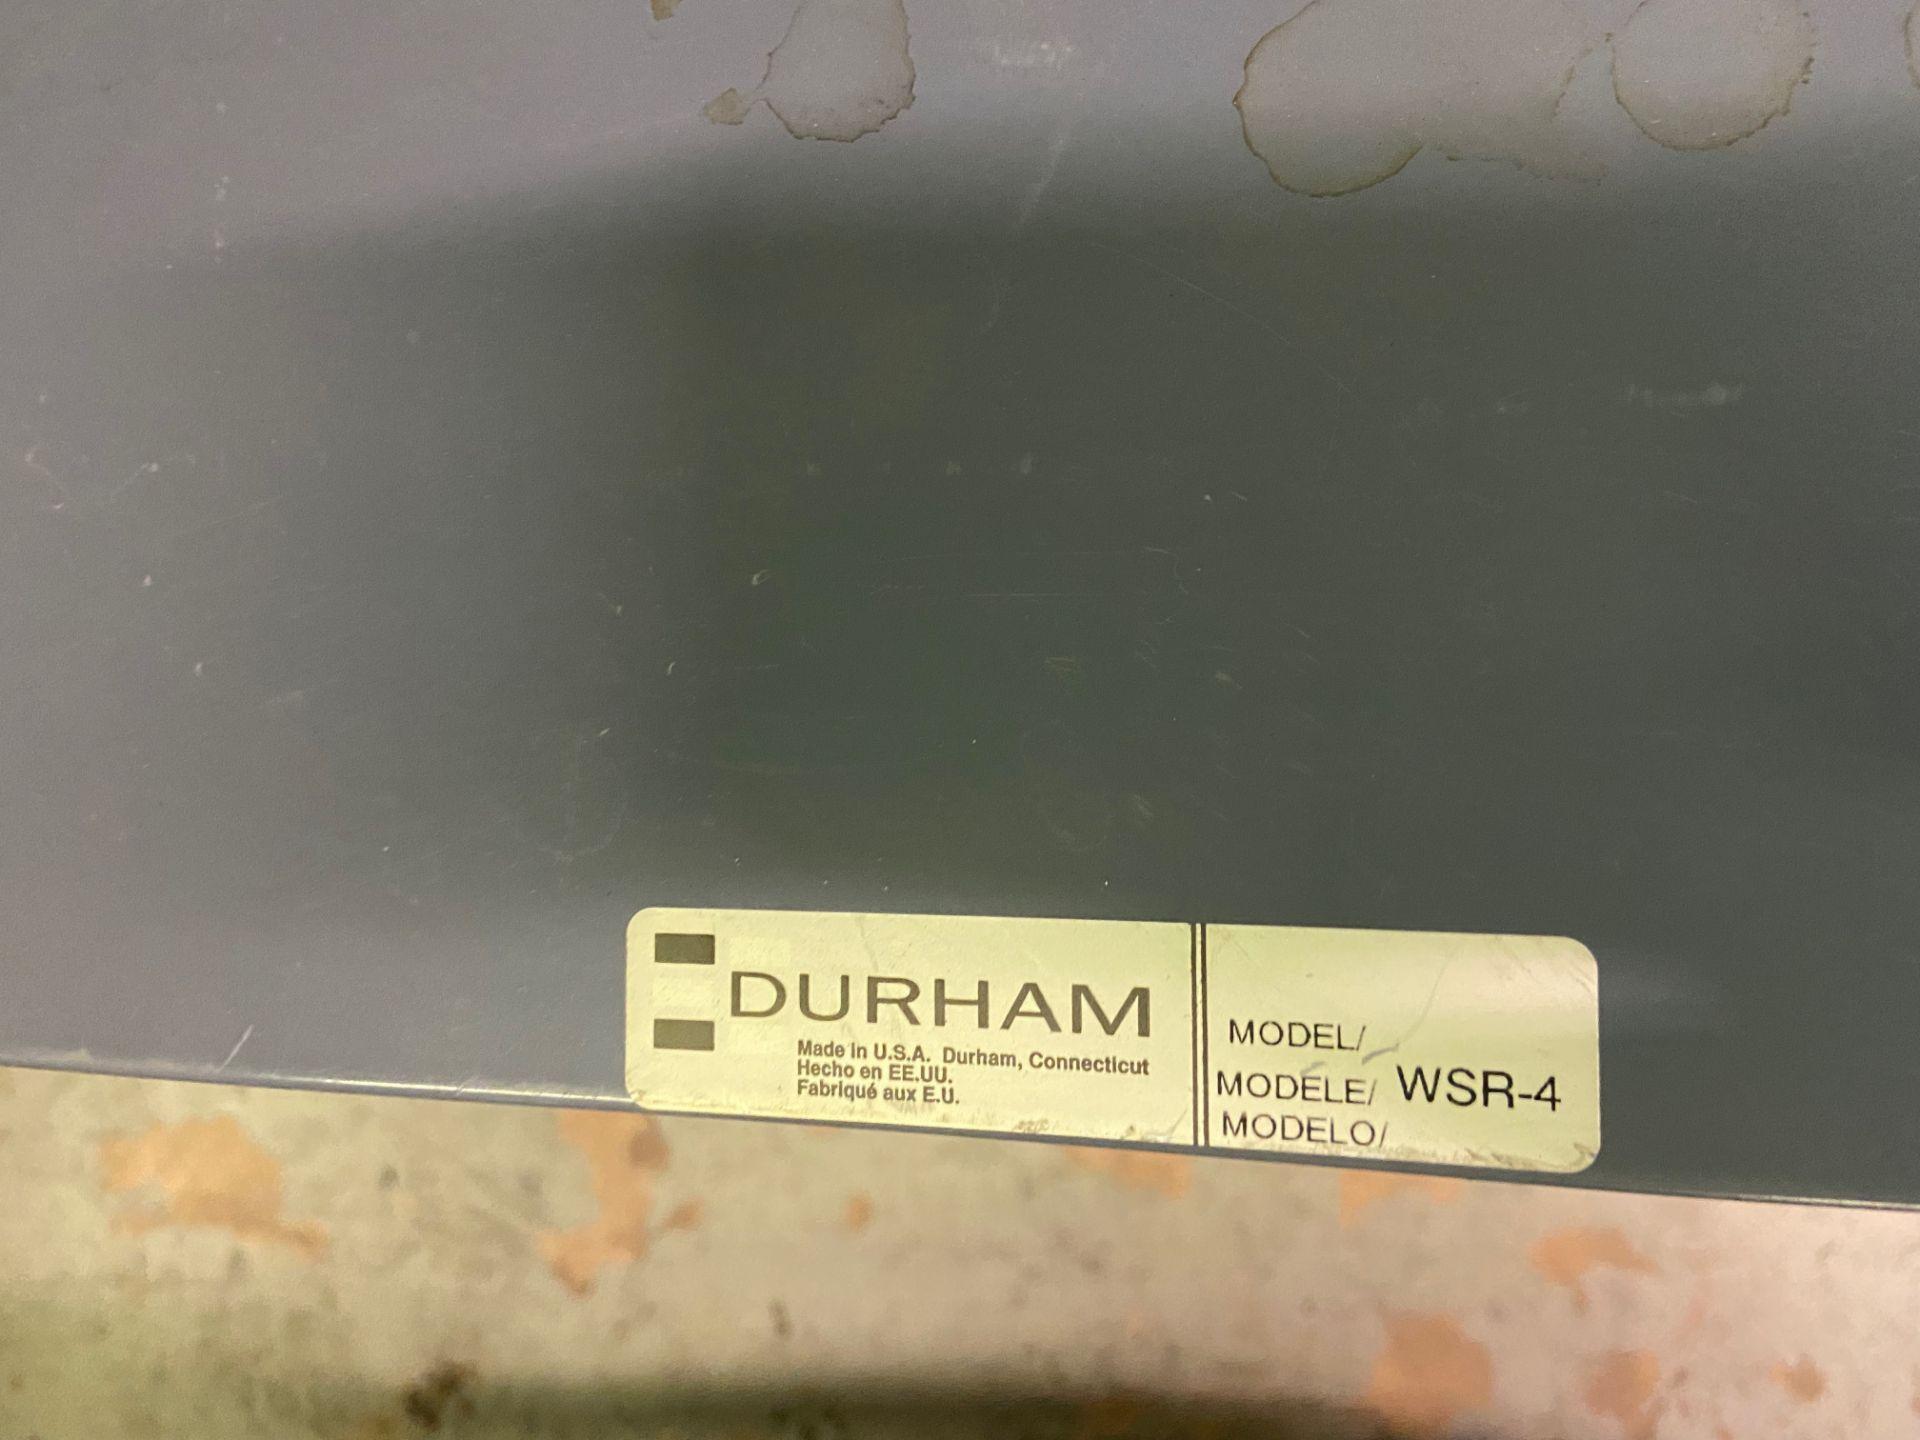 Durham Sheet Metal Brake/Bender, Model# WSR-4, Loading/Removal Fee: $20 - Image 4 of 5